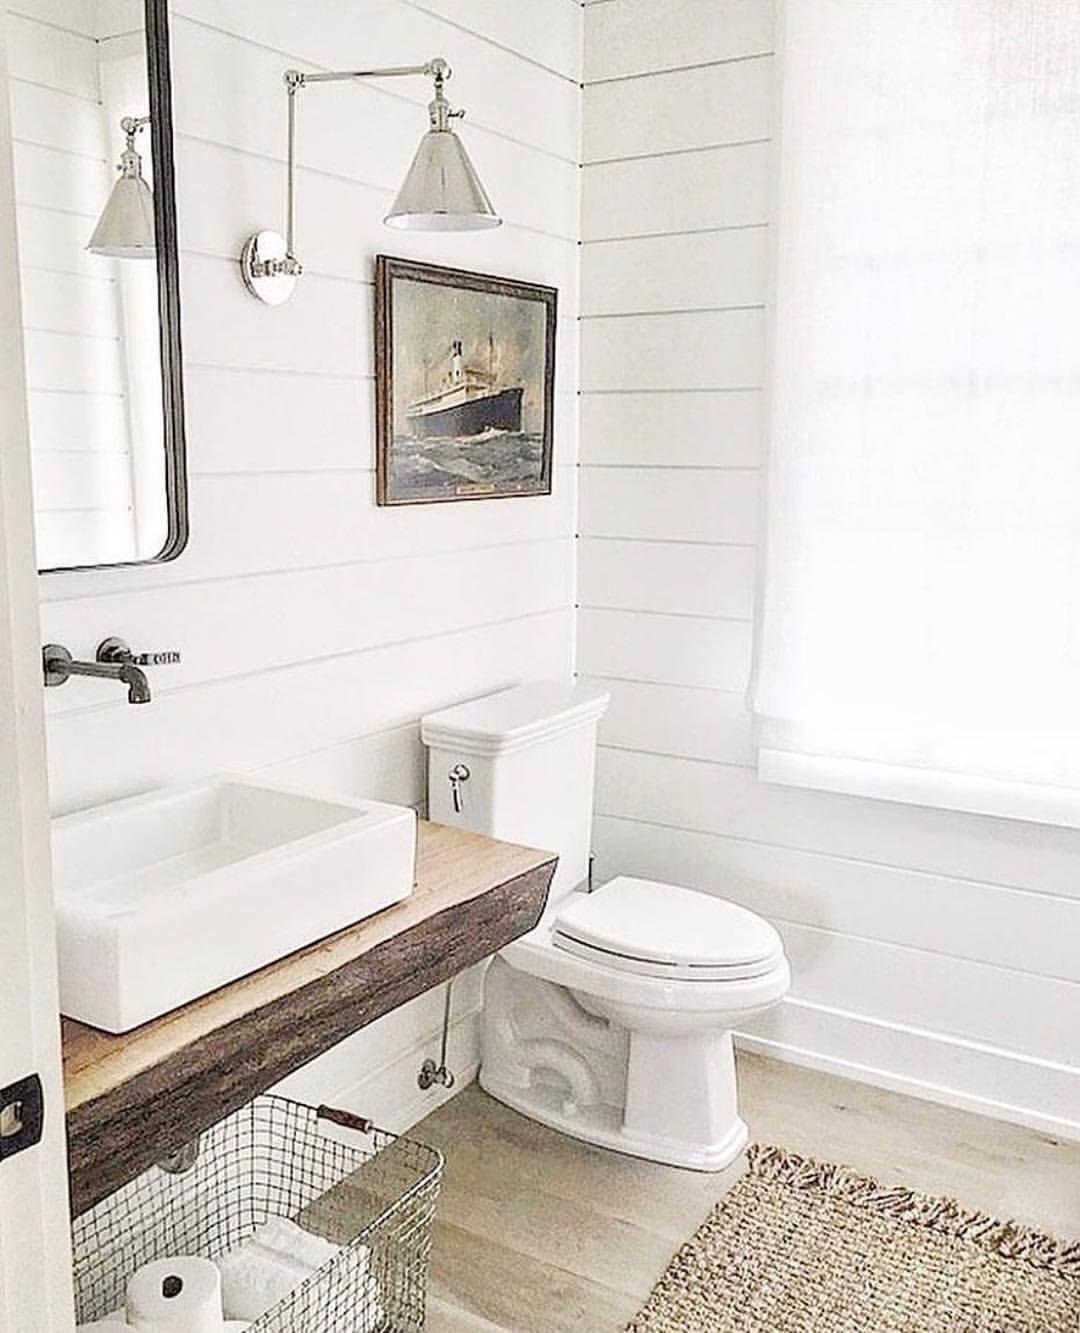 Shiplap Bathroom Vanity: White Shiplap Bathroom, Polished Nickel Sconce, Vintage